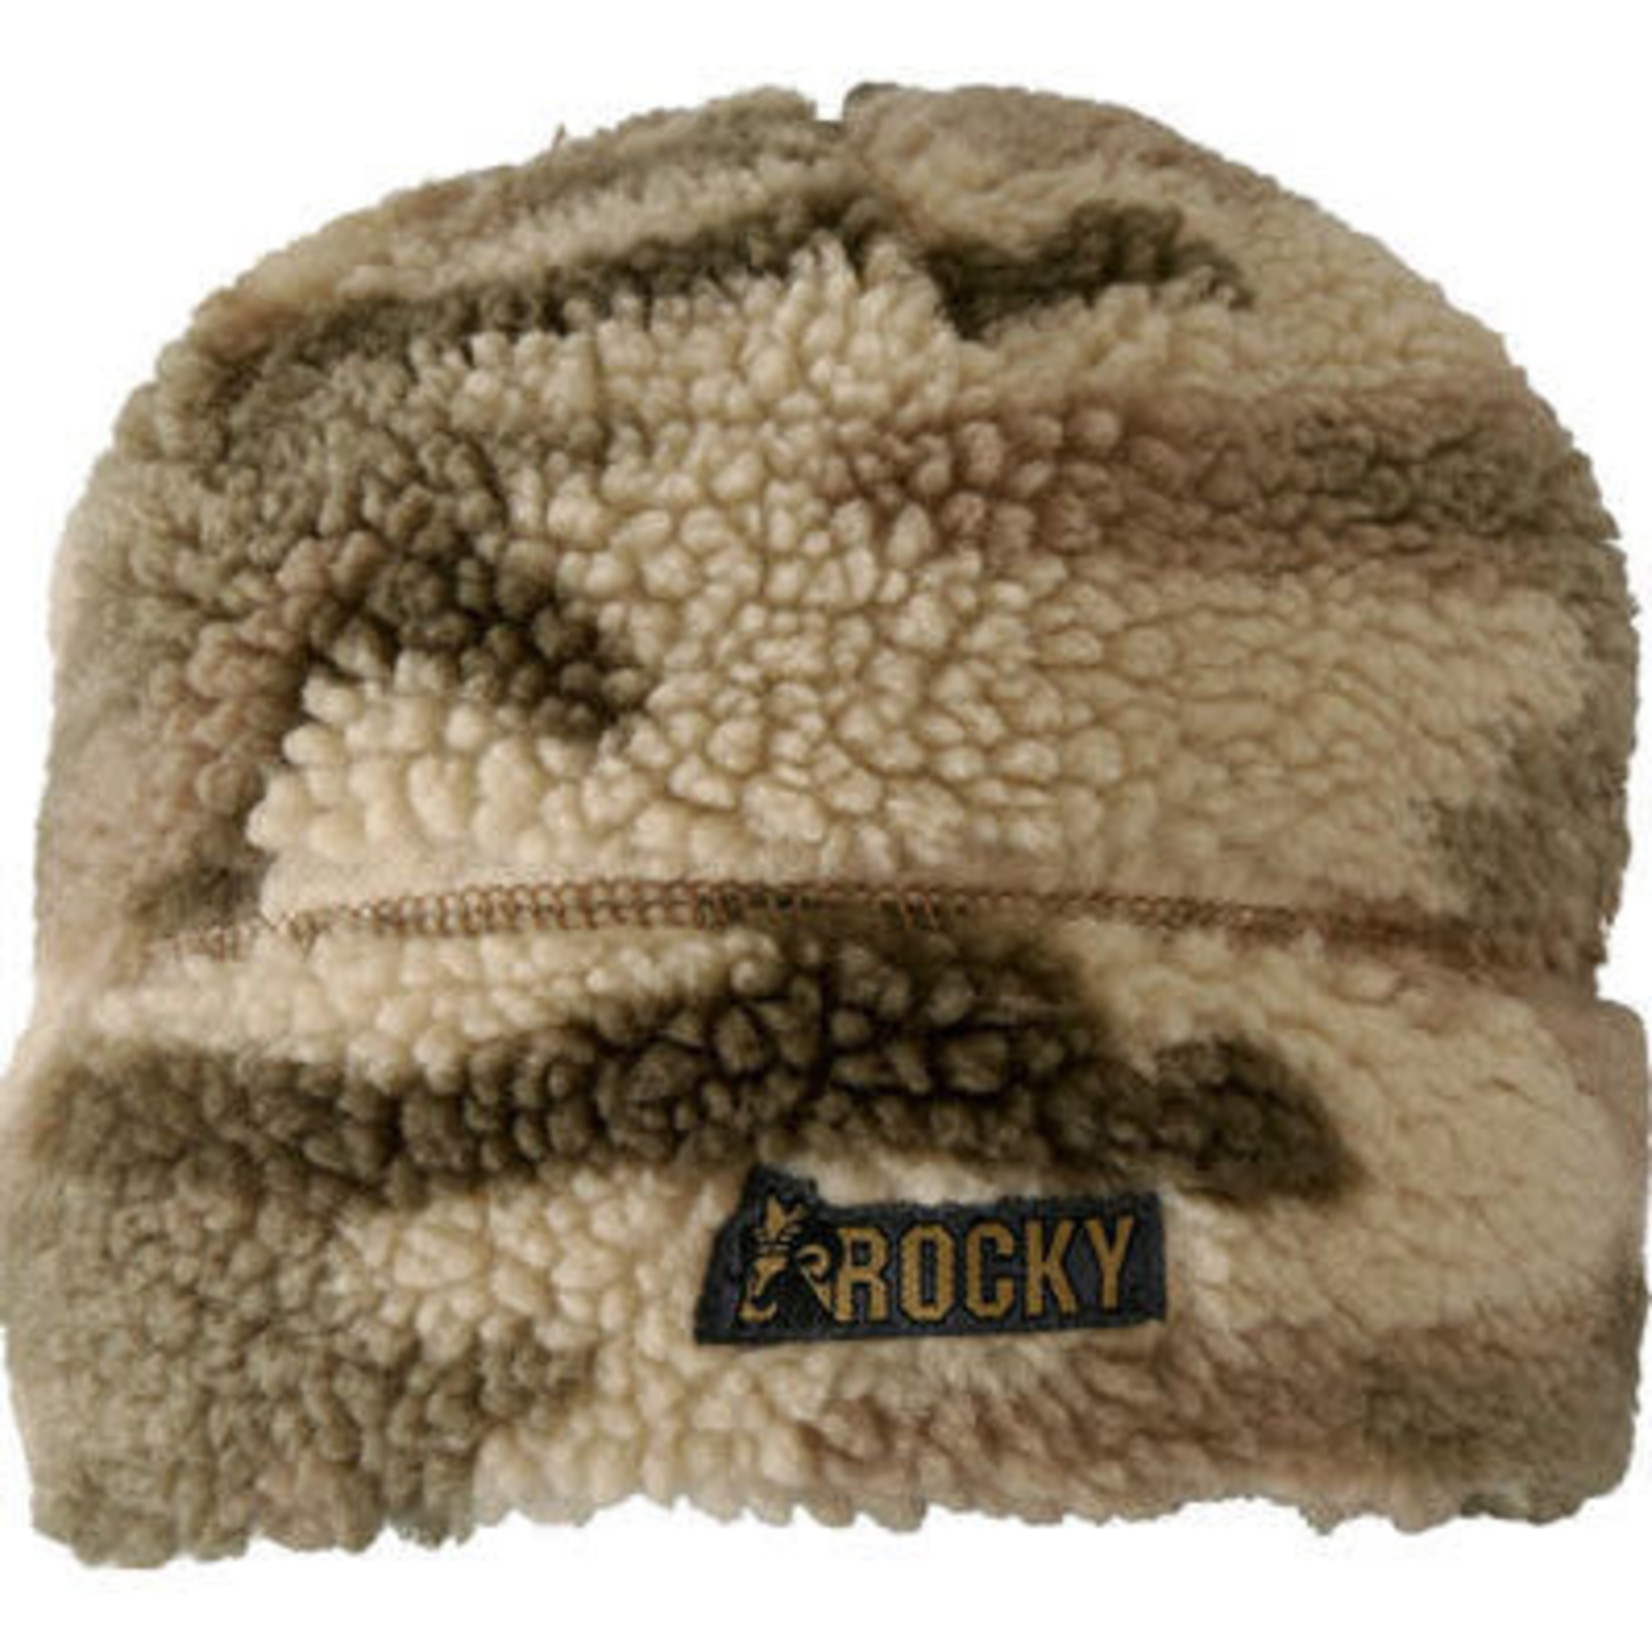 Rocky Berber Fleece Beanie- Venator